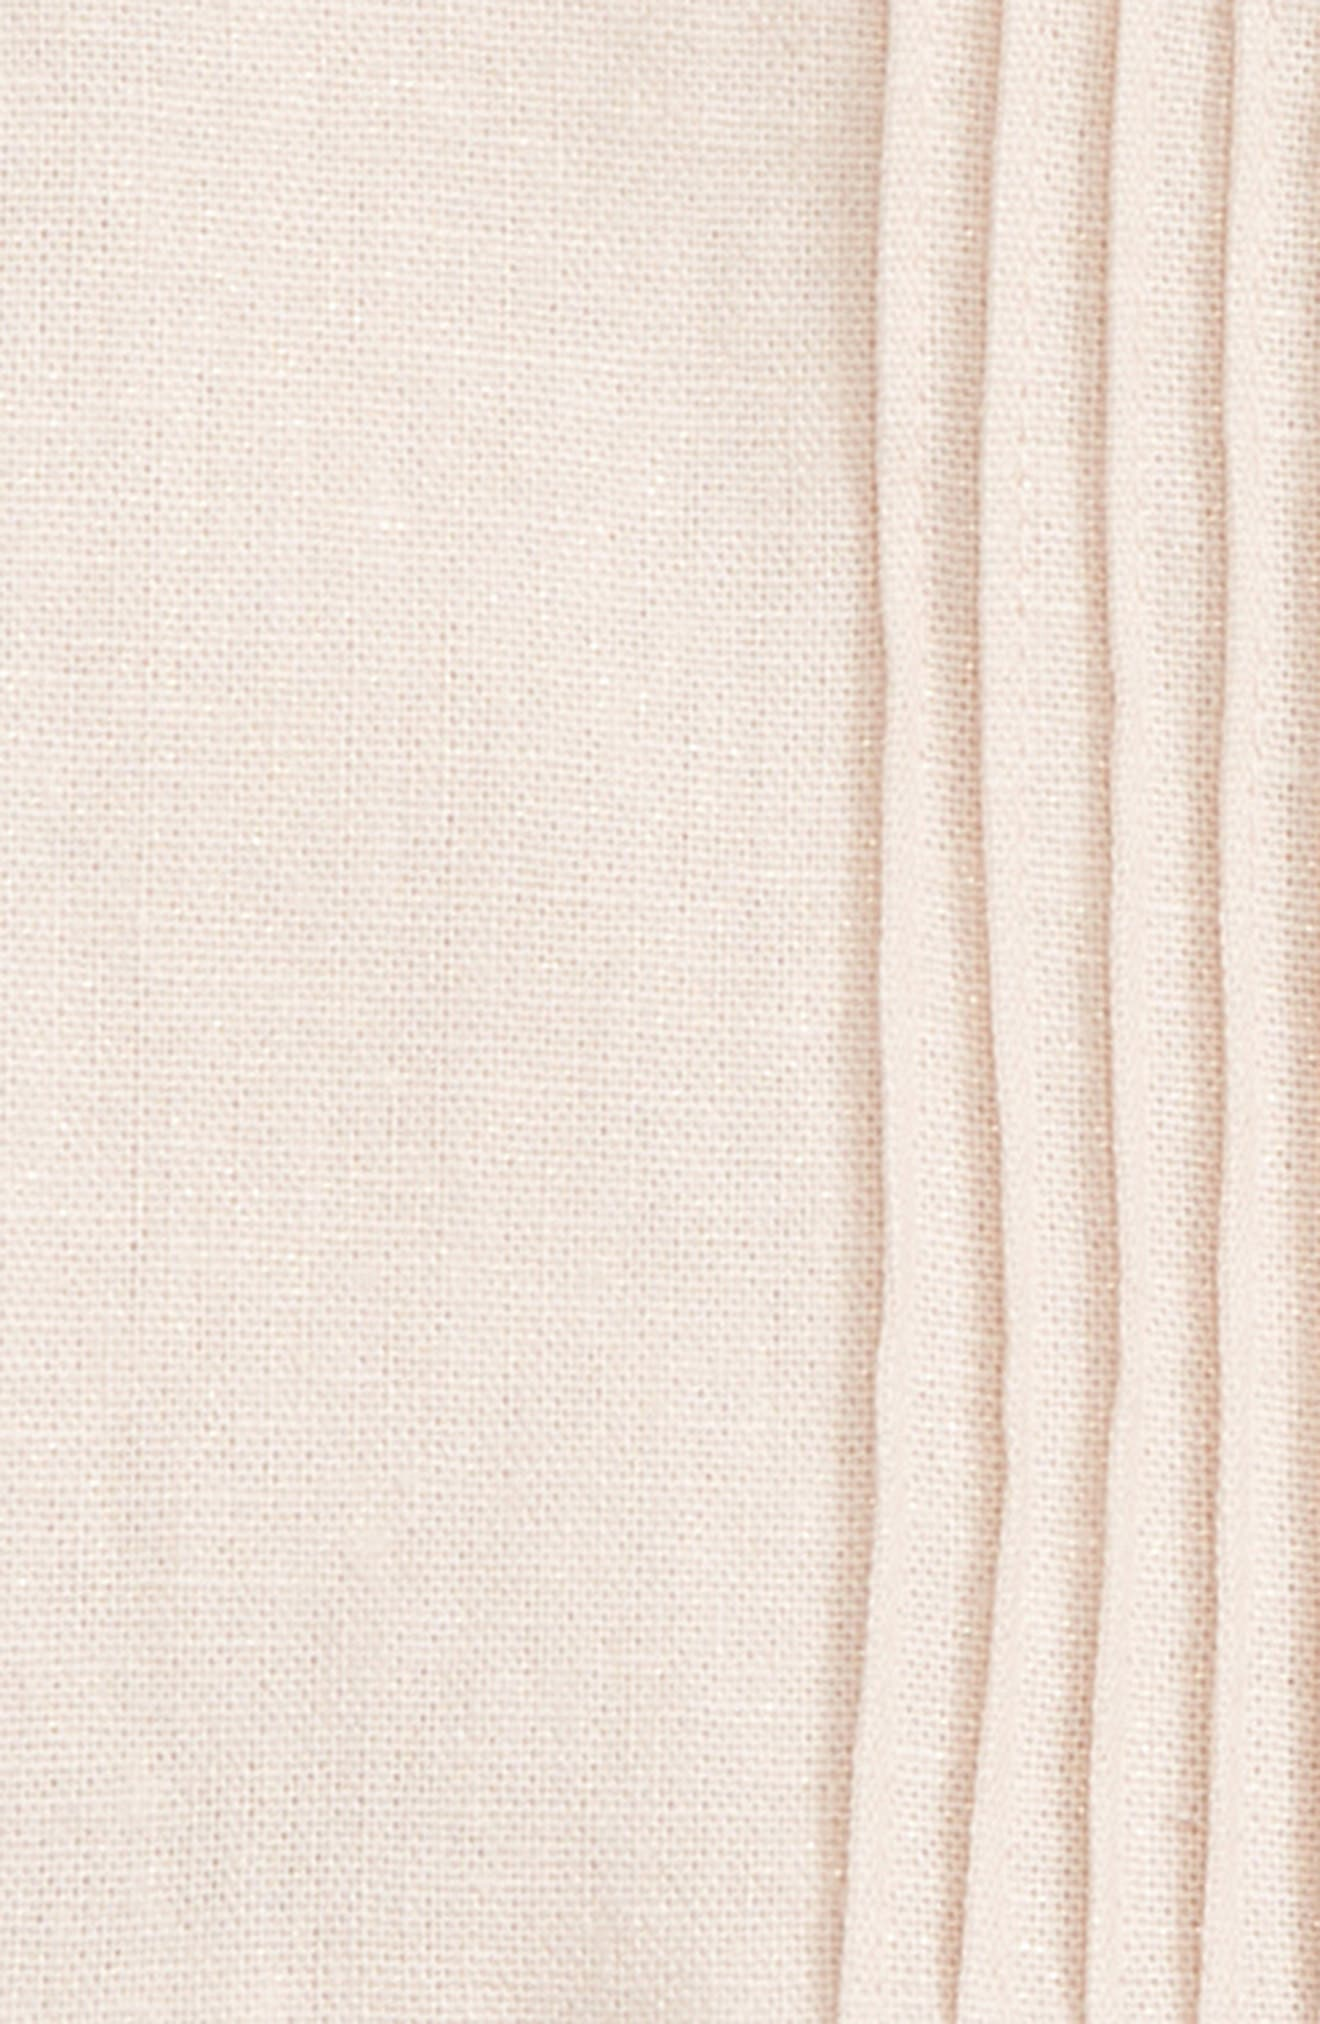 Sofia Pleated Linen Blend Dress,                             Alternate thumbnail 2, color,                             650